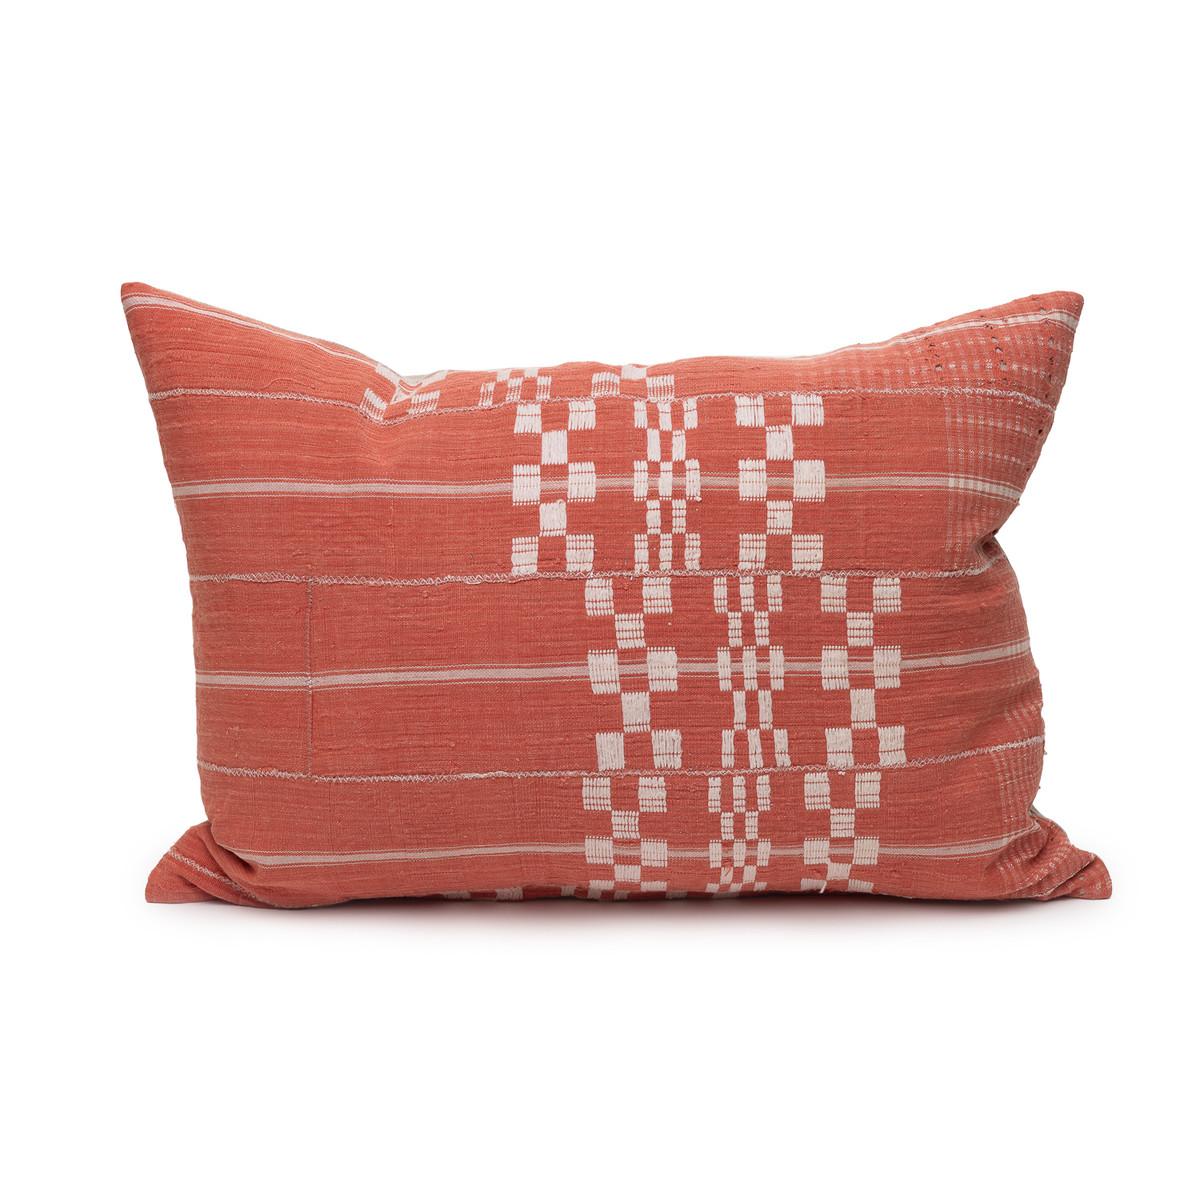 Coral Seas Aso Oke Luxe Vintage Lumbar Pillow - 16 x 22 - Front